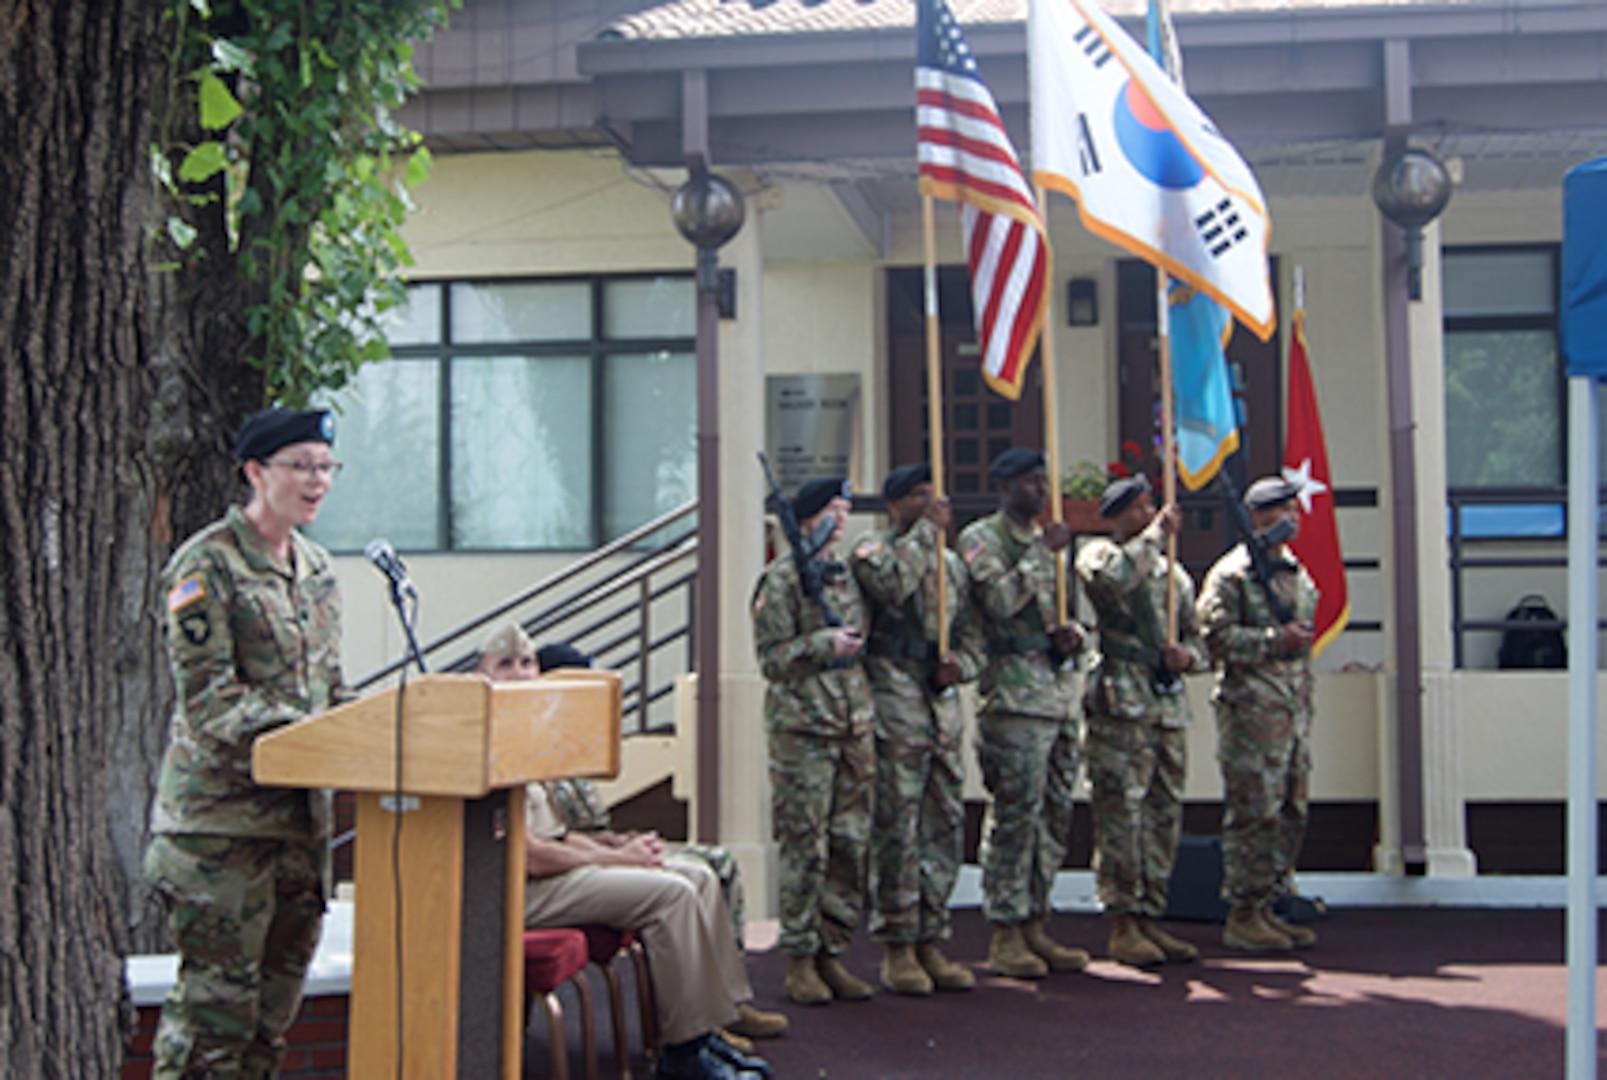 The new DLA Energy Pacific at Korea Commander Army Lt. Col. Faith Chamberlain addresses the audience at the DLA Energy Pacific at Korea change of command ceremony in Camp Walker, Daegu, Korea, June 28